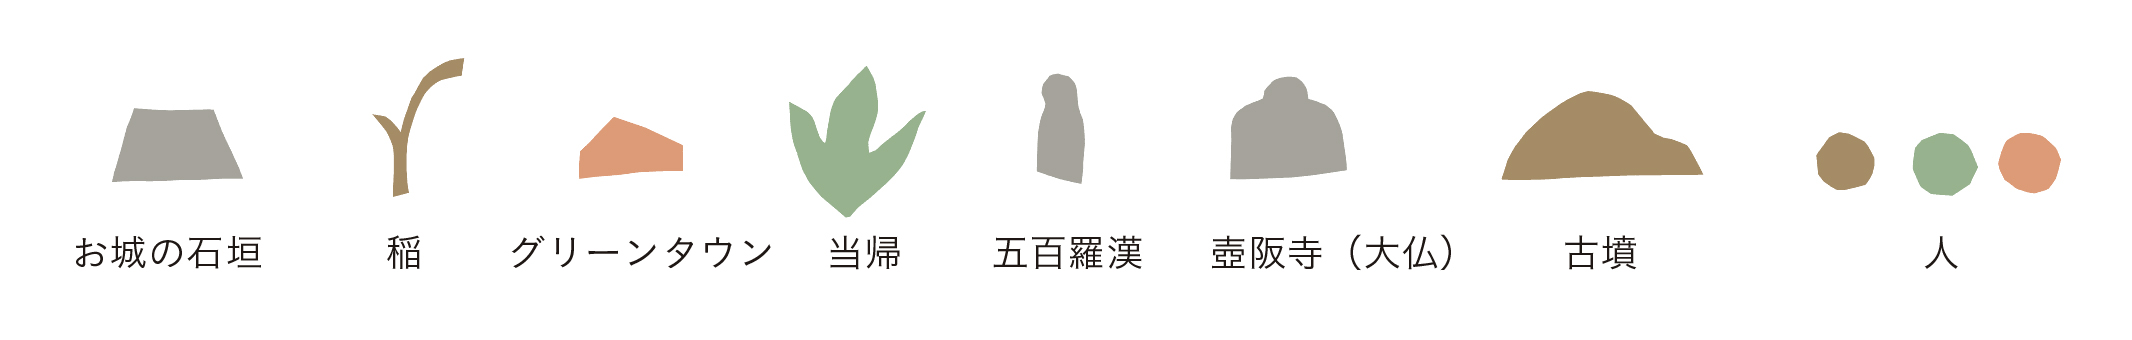 logo_parts.jpg